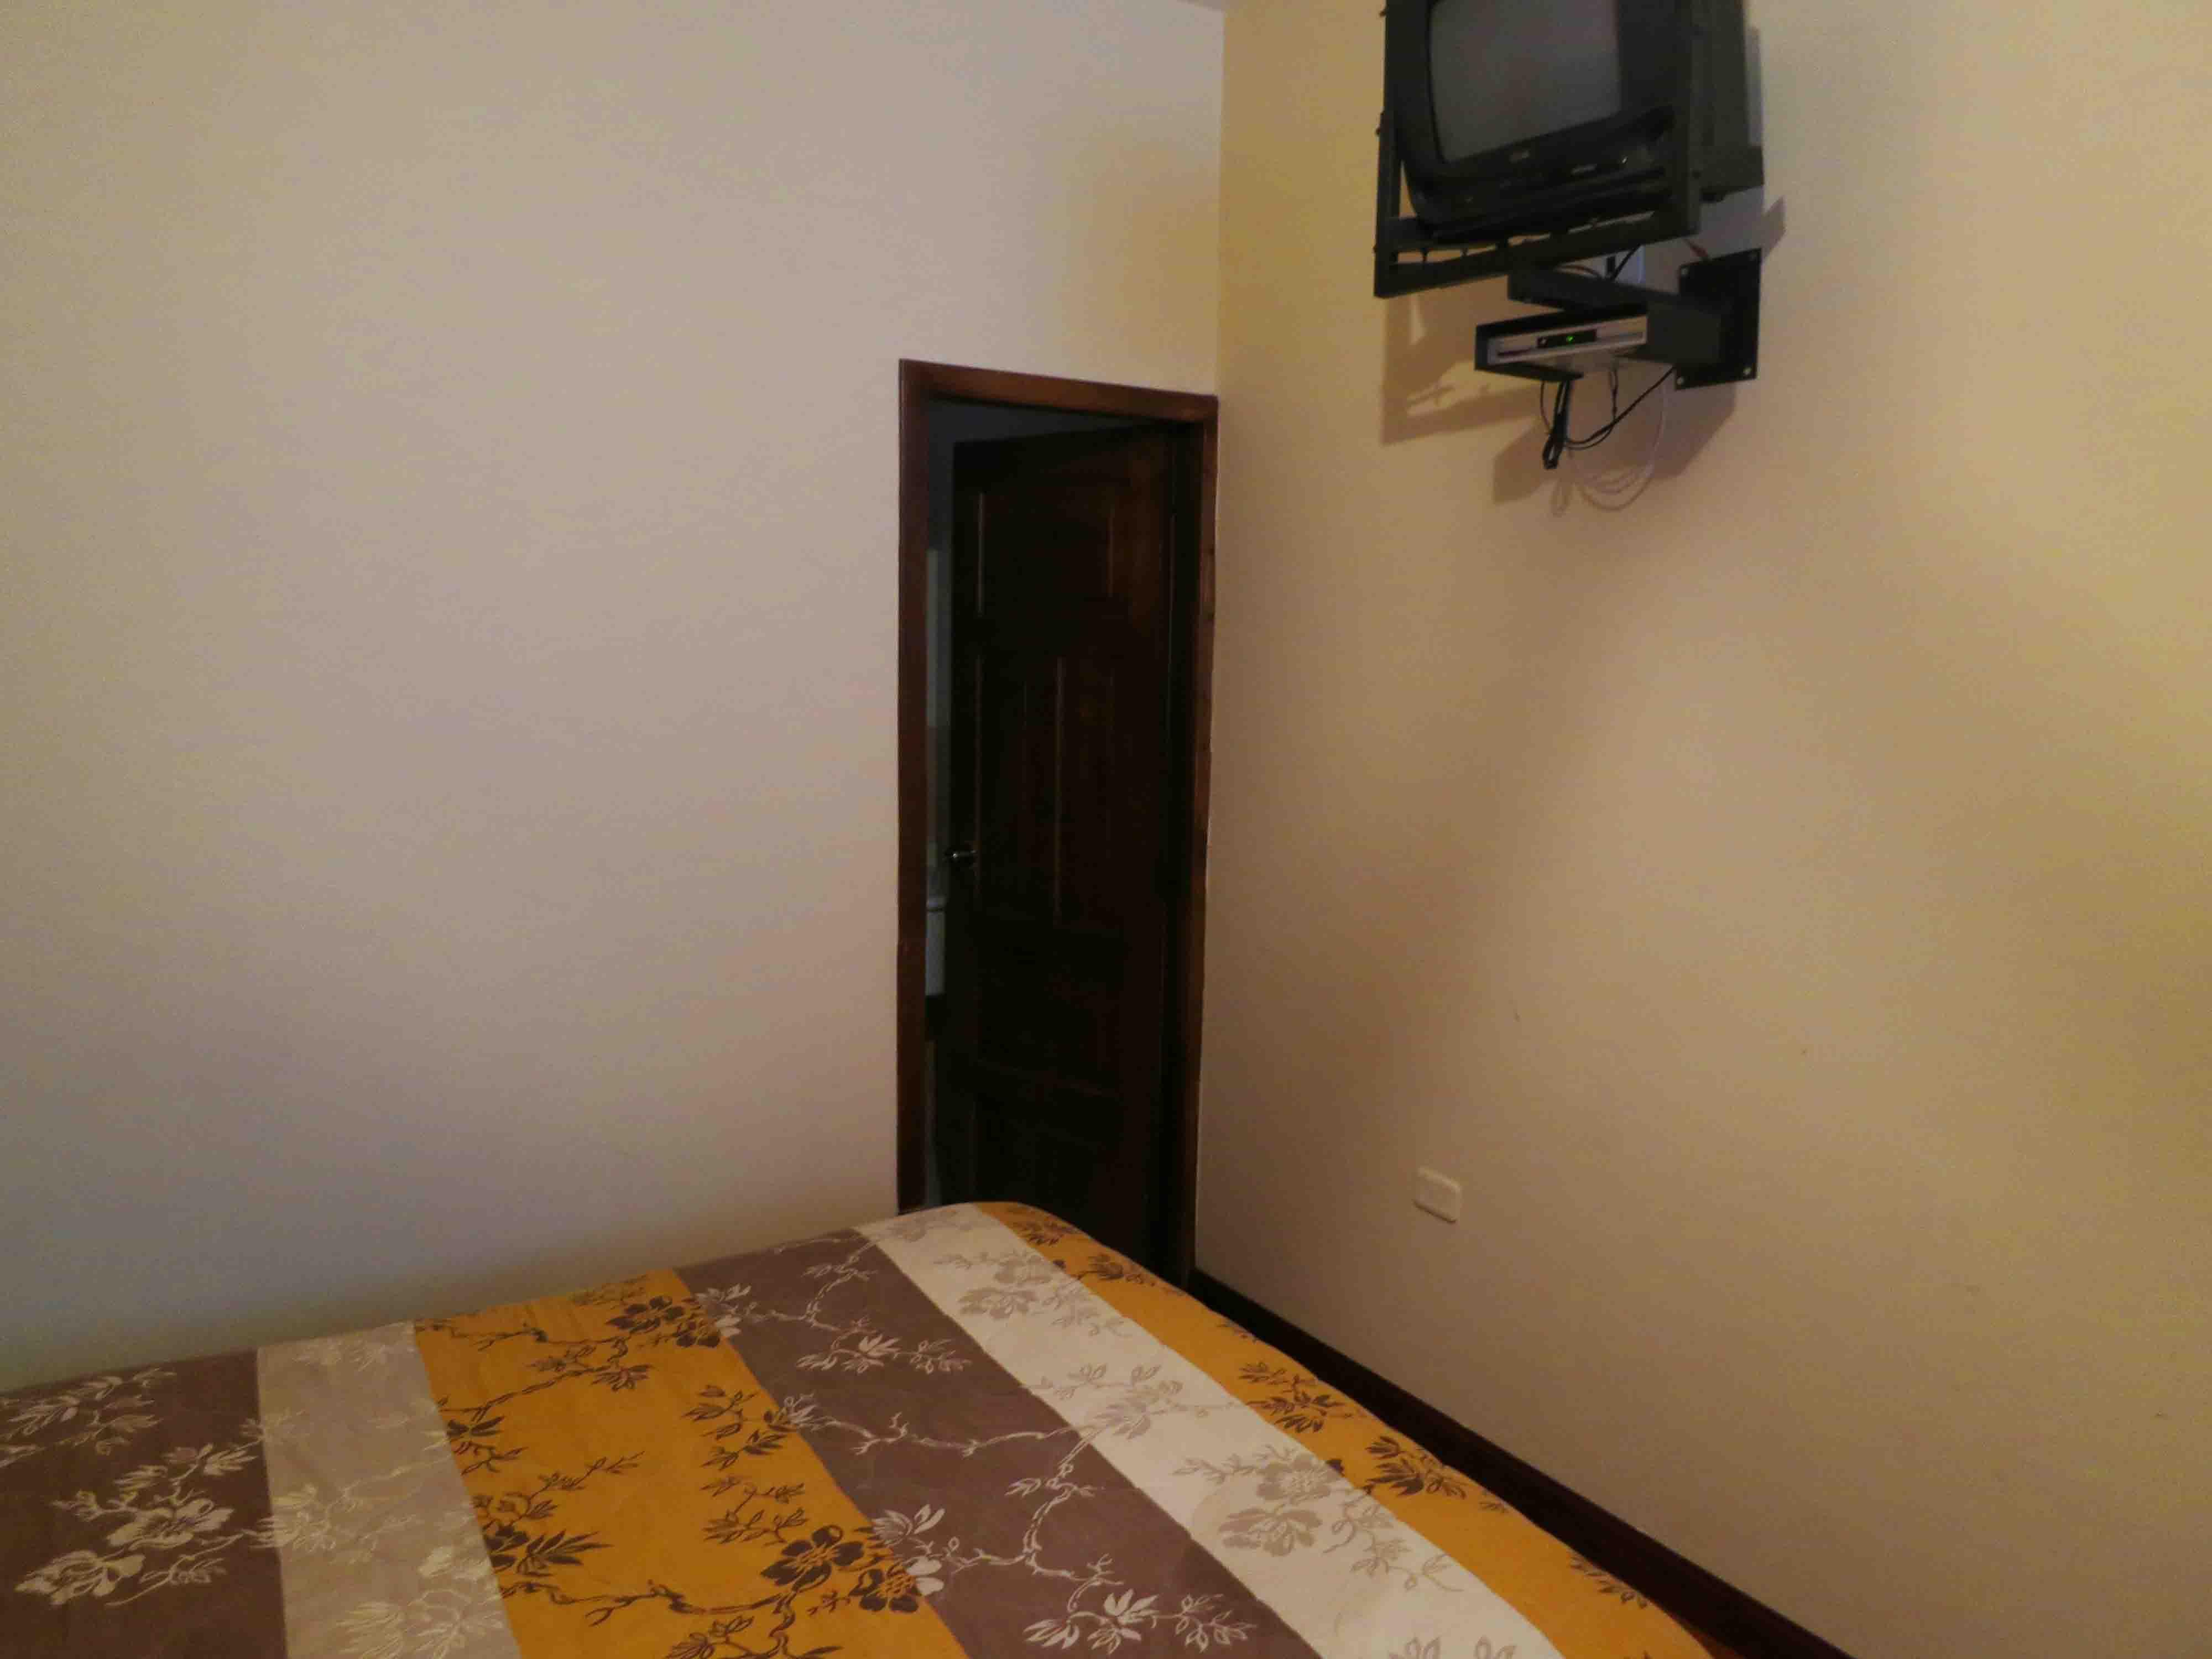 accommodation review – hotel san francisco, quito, ecuador